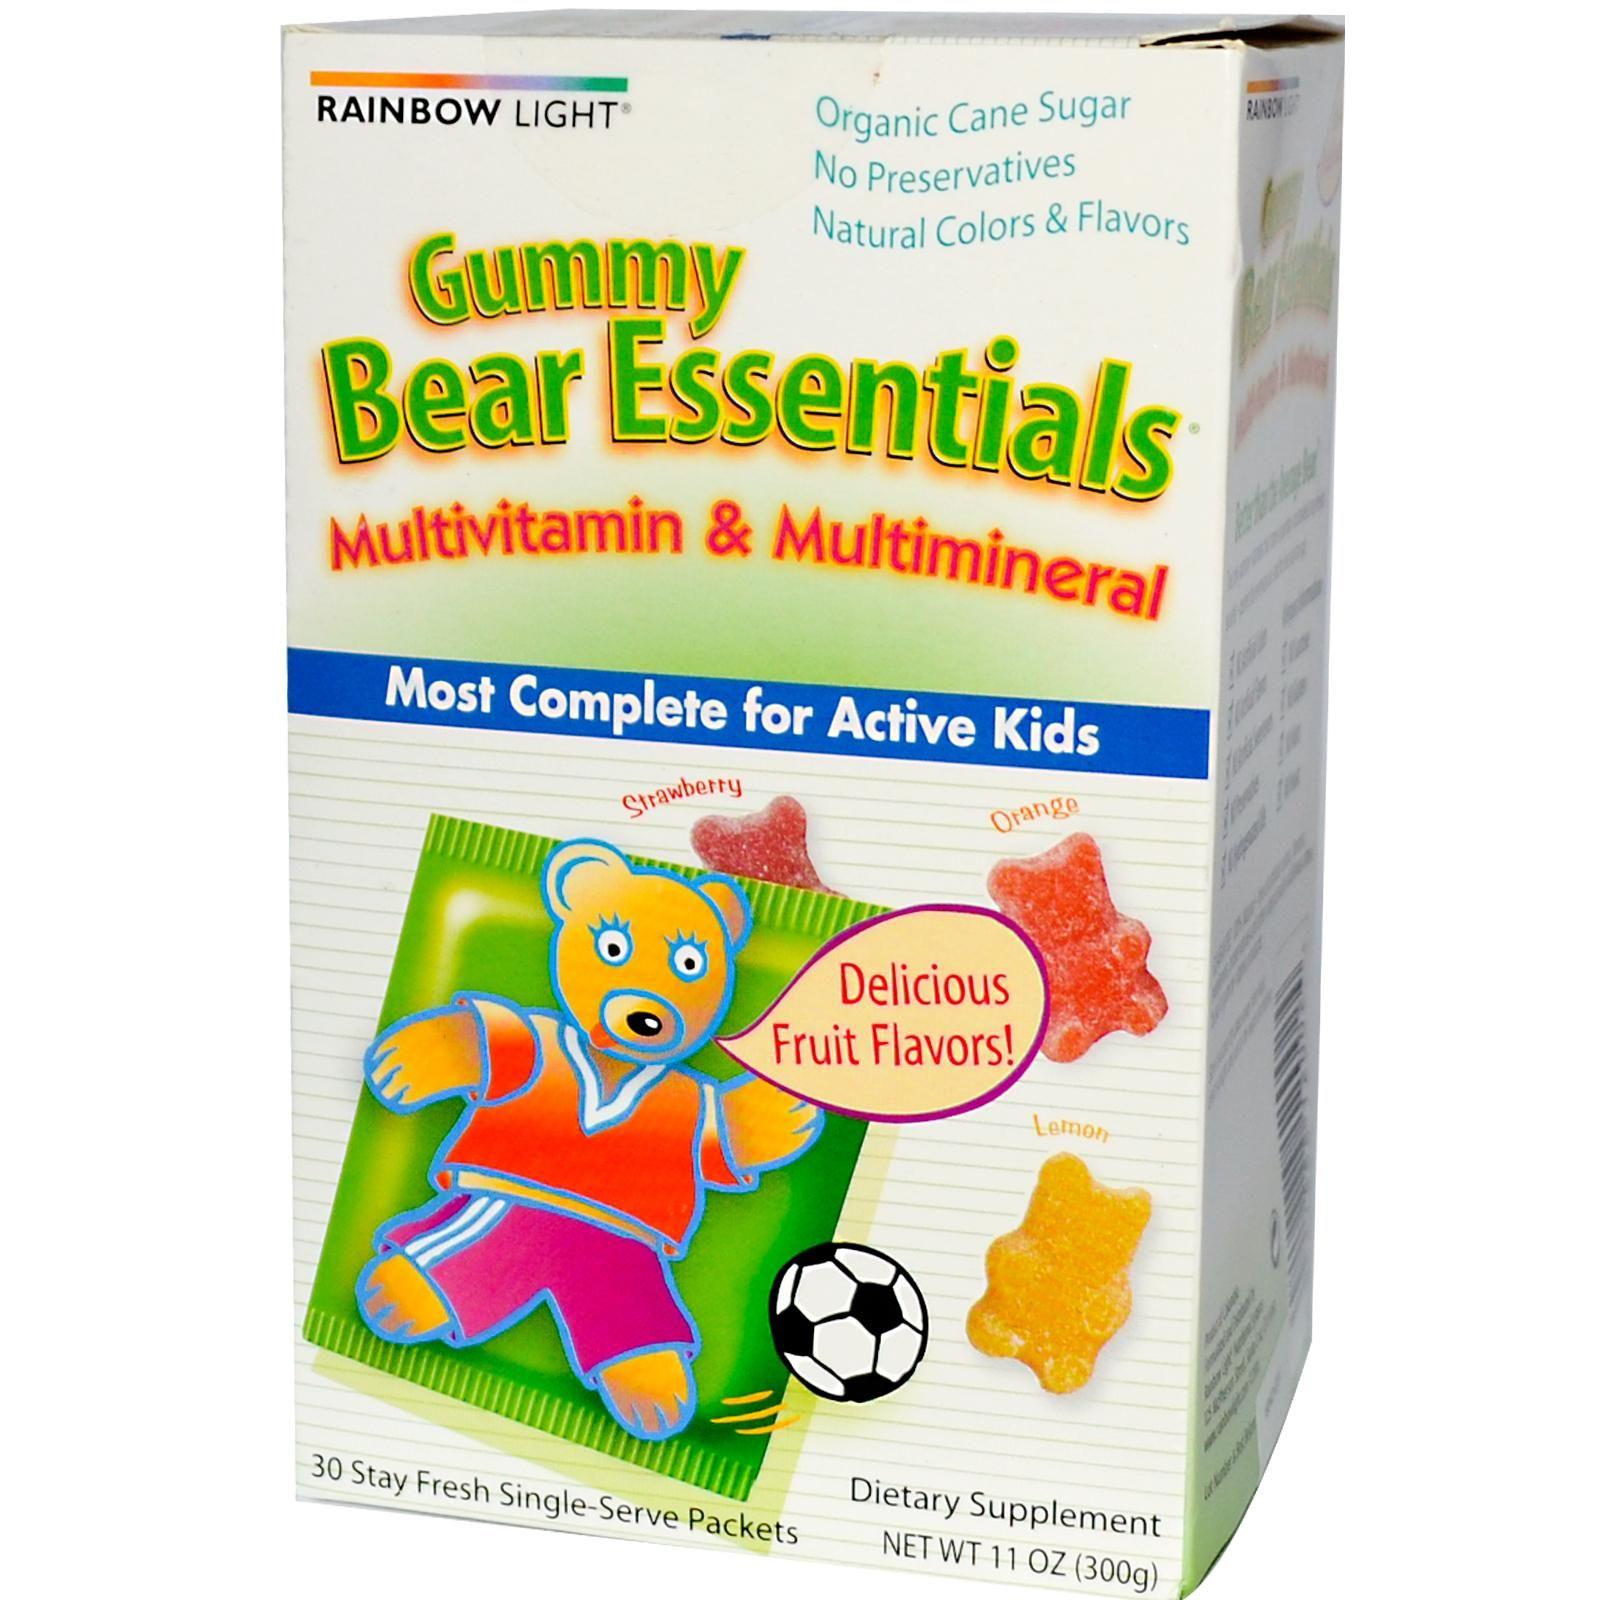 Rainbow Light Bear Essentials Multivitamin Multimineral Gummies Wellness Gummy Kids 30 Strawberry Orange Lemon Flavors 3 Per Packet 90